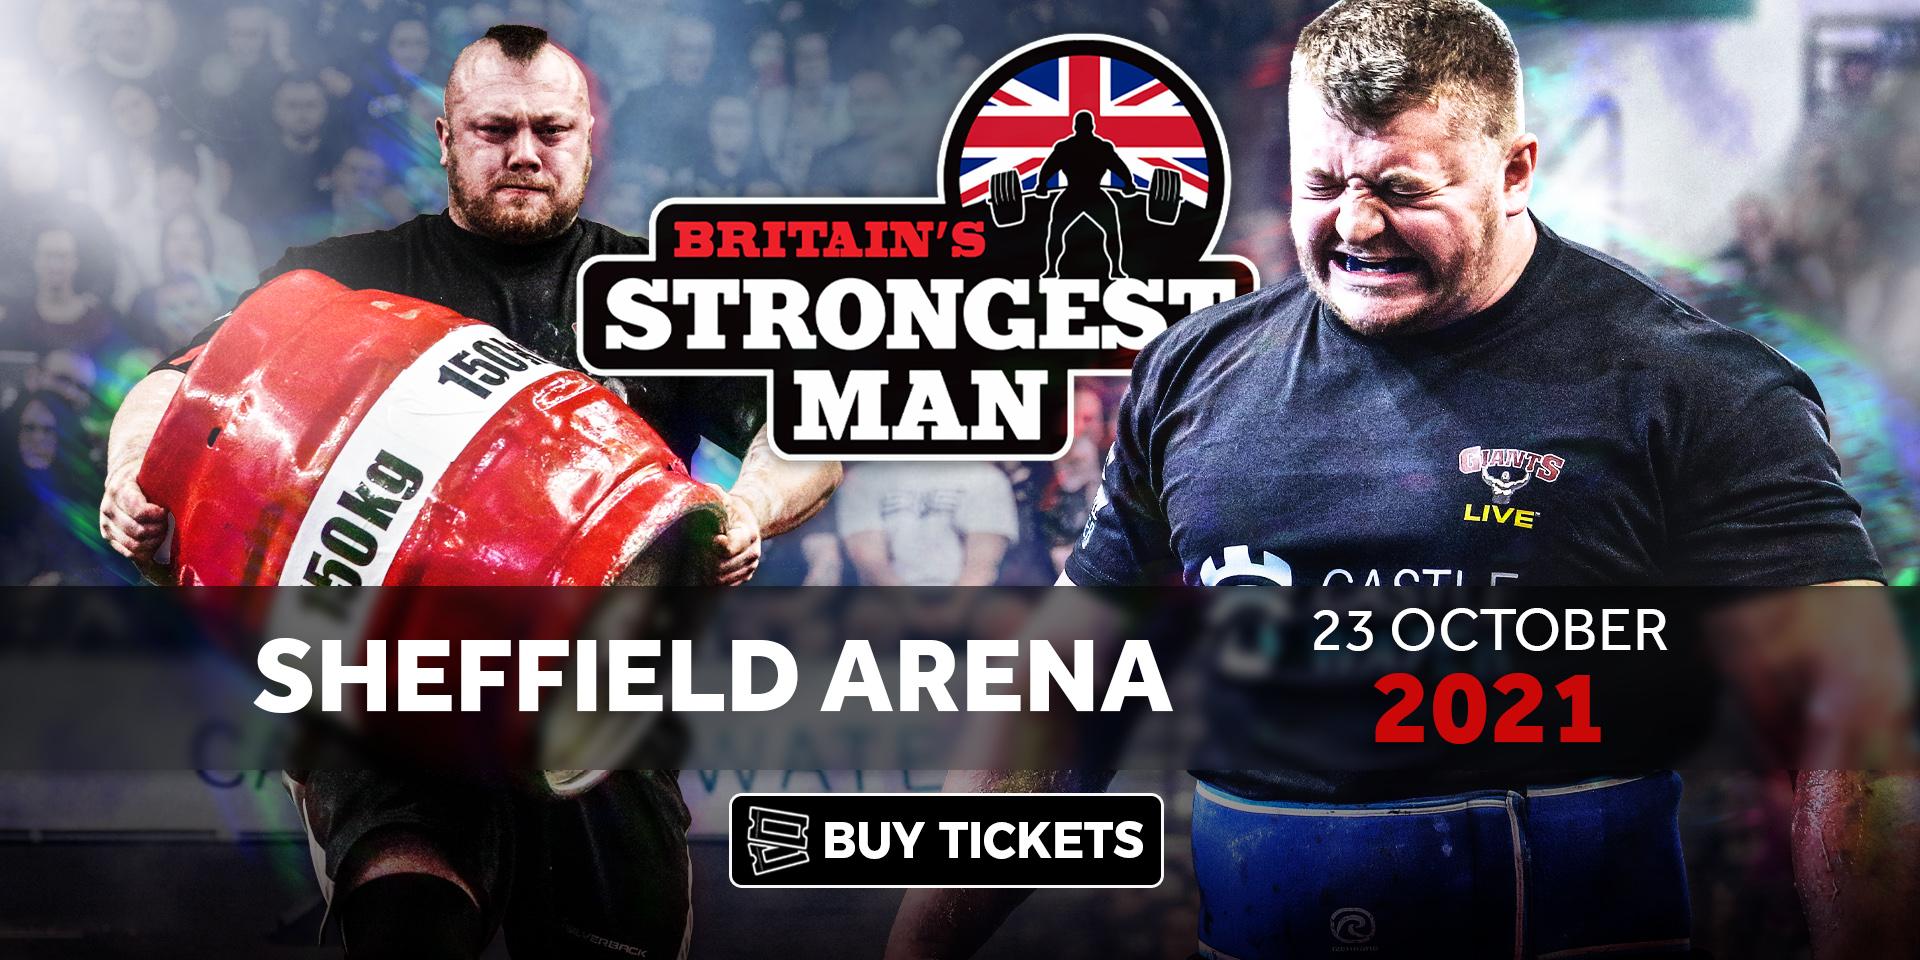 Britain's Strongest Man 2021